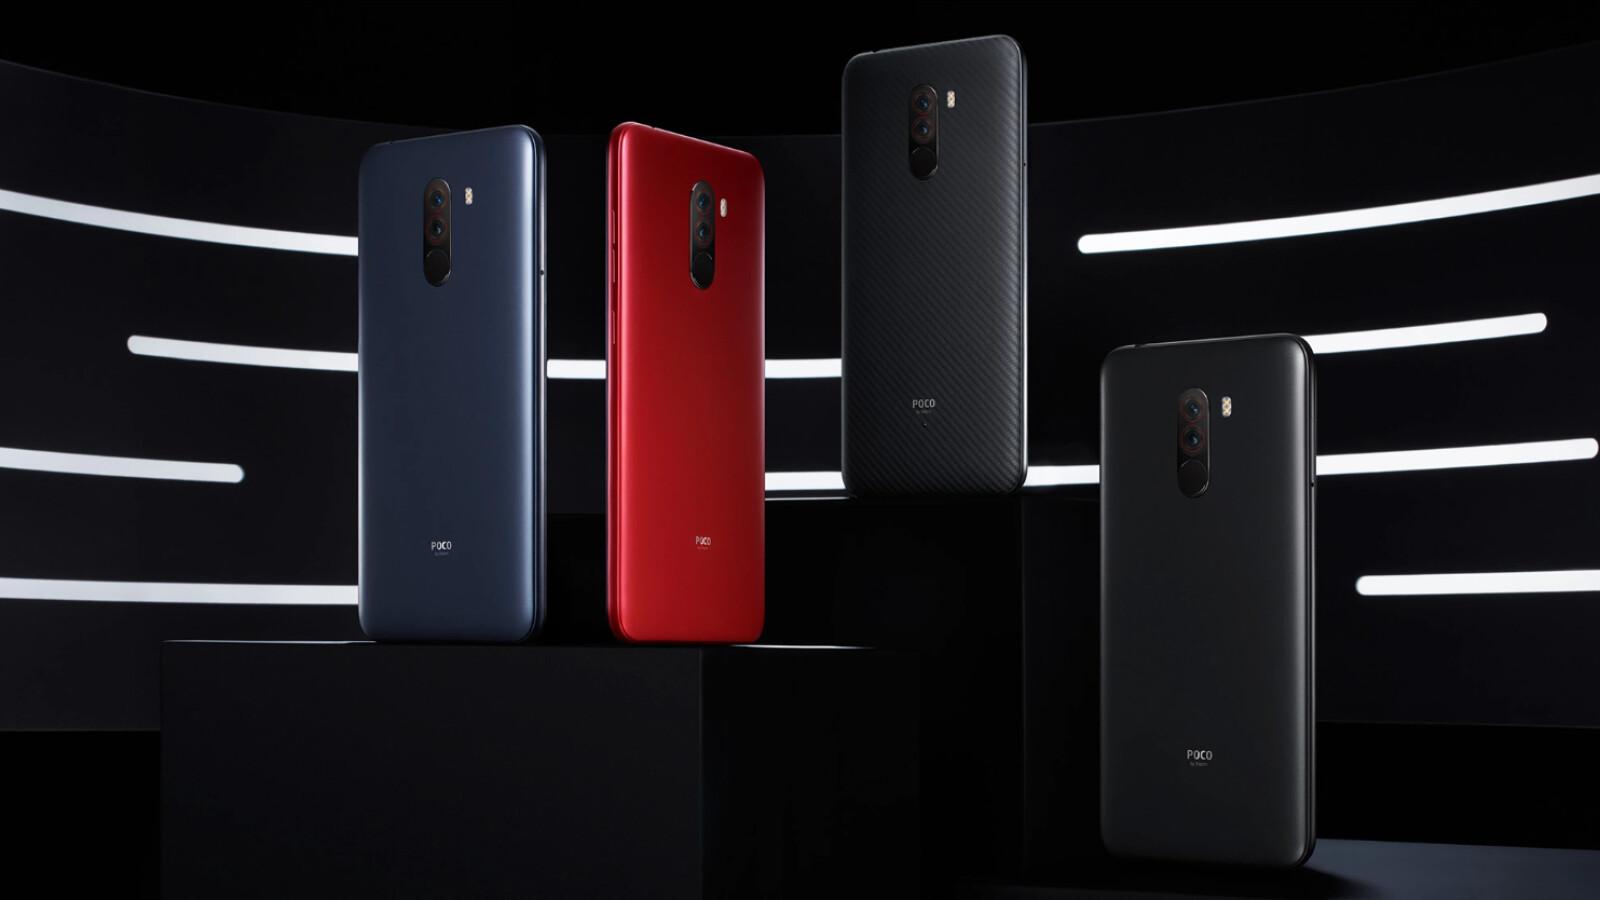 Poco Farben.Poco F1 Xiaomi Shows Snapdragon 845 Smartphone For 260 Euros